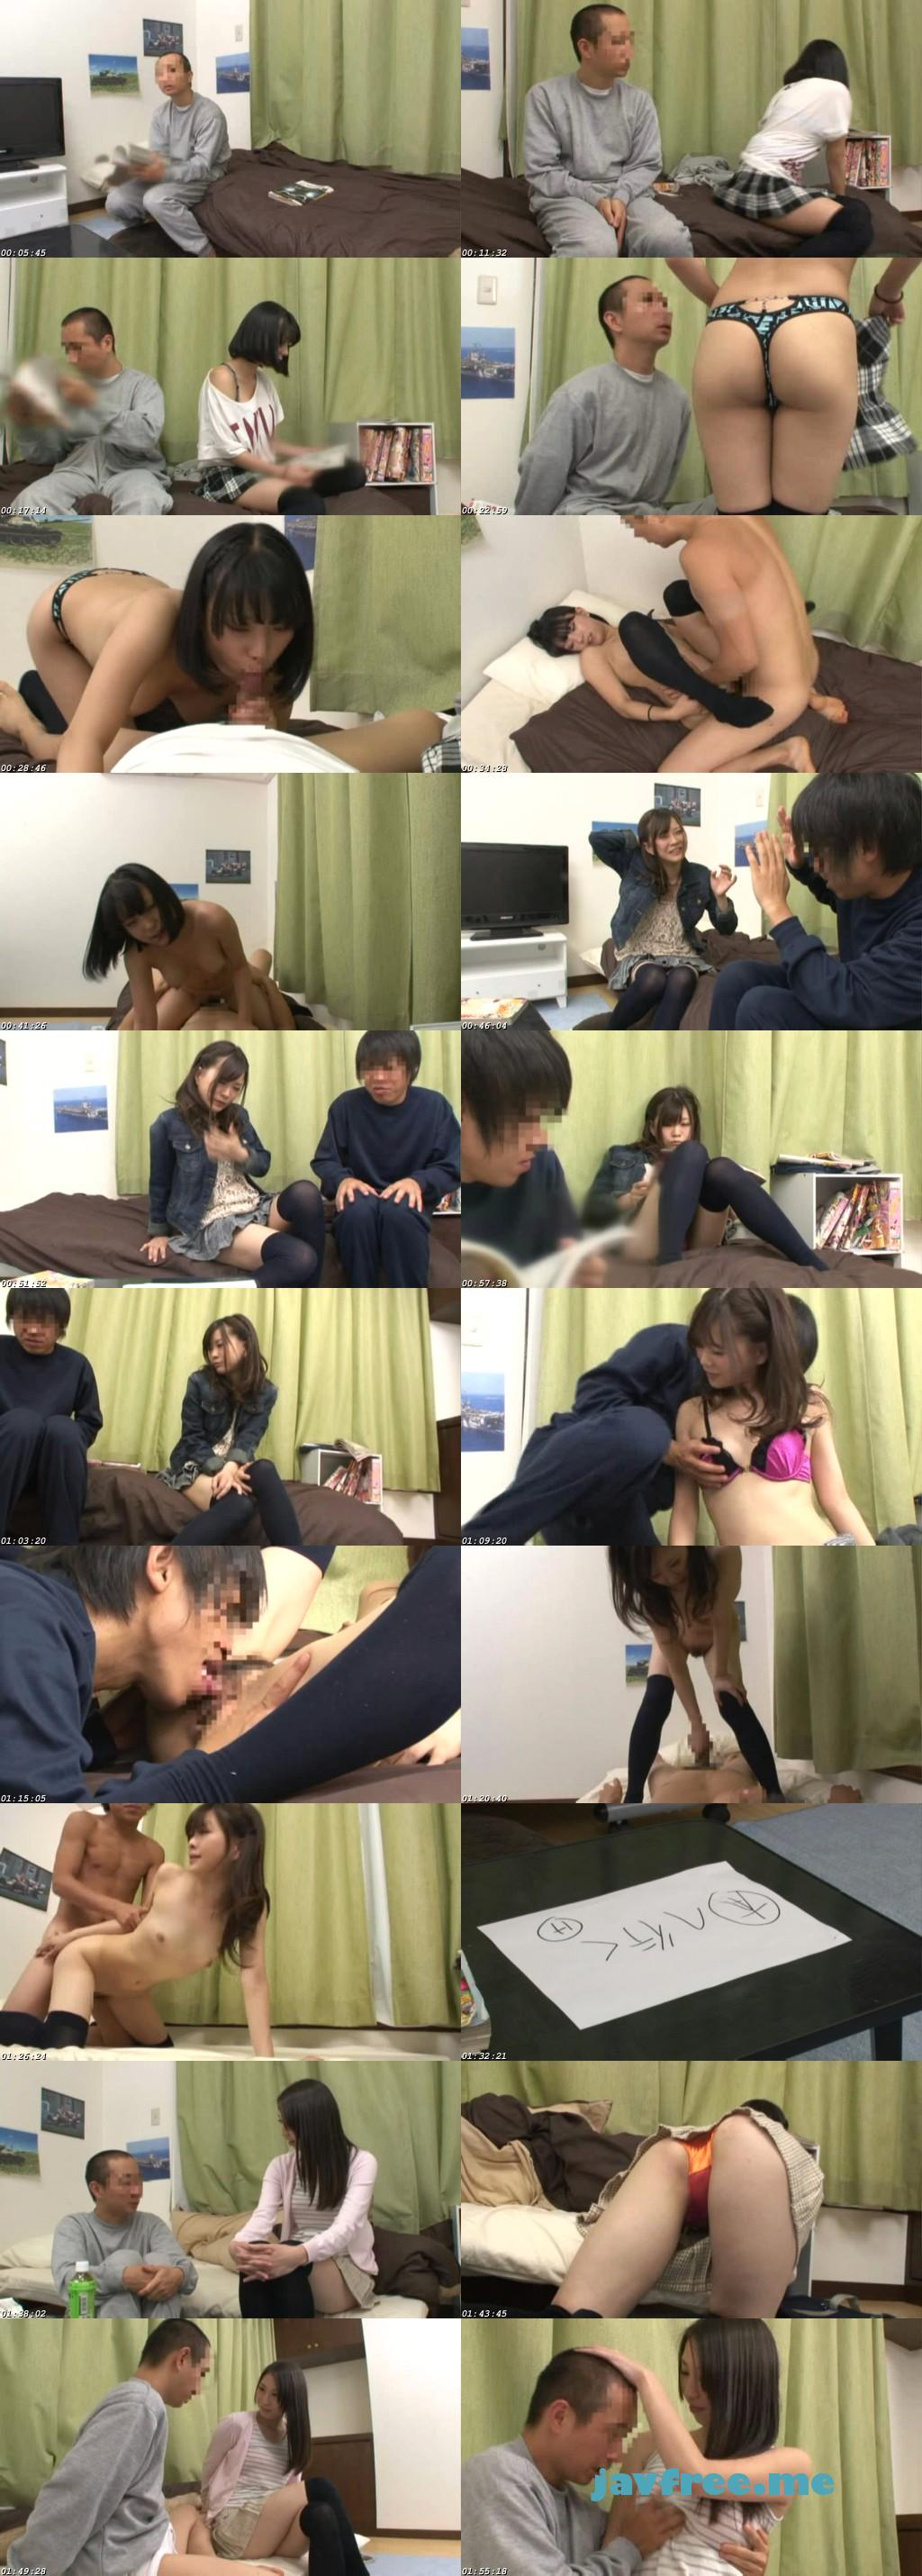 [HUNT-674] ショック! ○い頃超キレイで真面目だった親戚のお姉ちゃんがヤリマンに!?東京の大学に行ってすっかりヤリマンになってしまった親戚のお姉ちゃんが親族の集まりで我が家にやってきて久しぶりに再会!! - image HUNT-674a on https://javfree.me